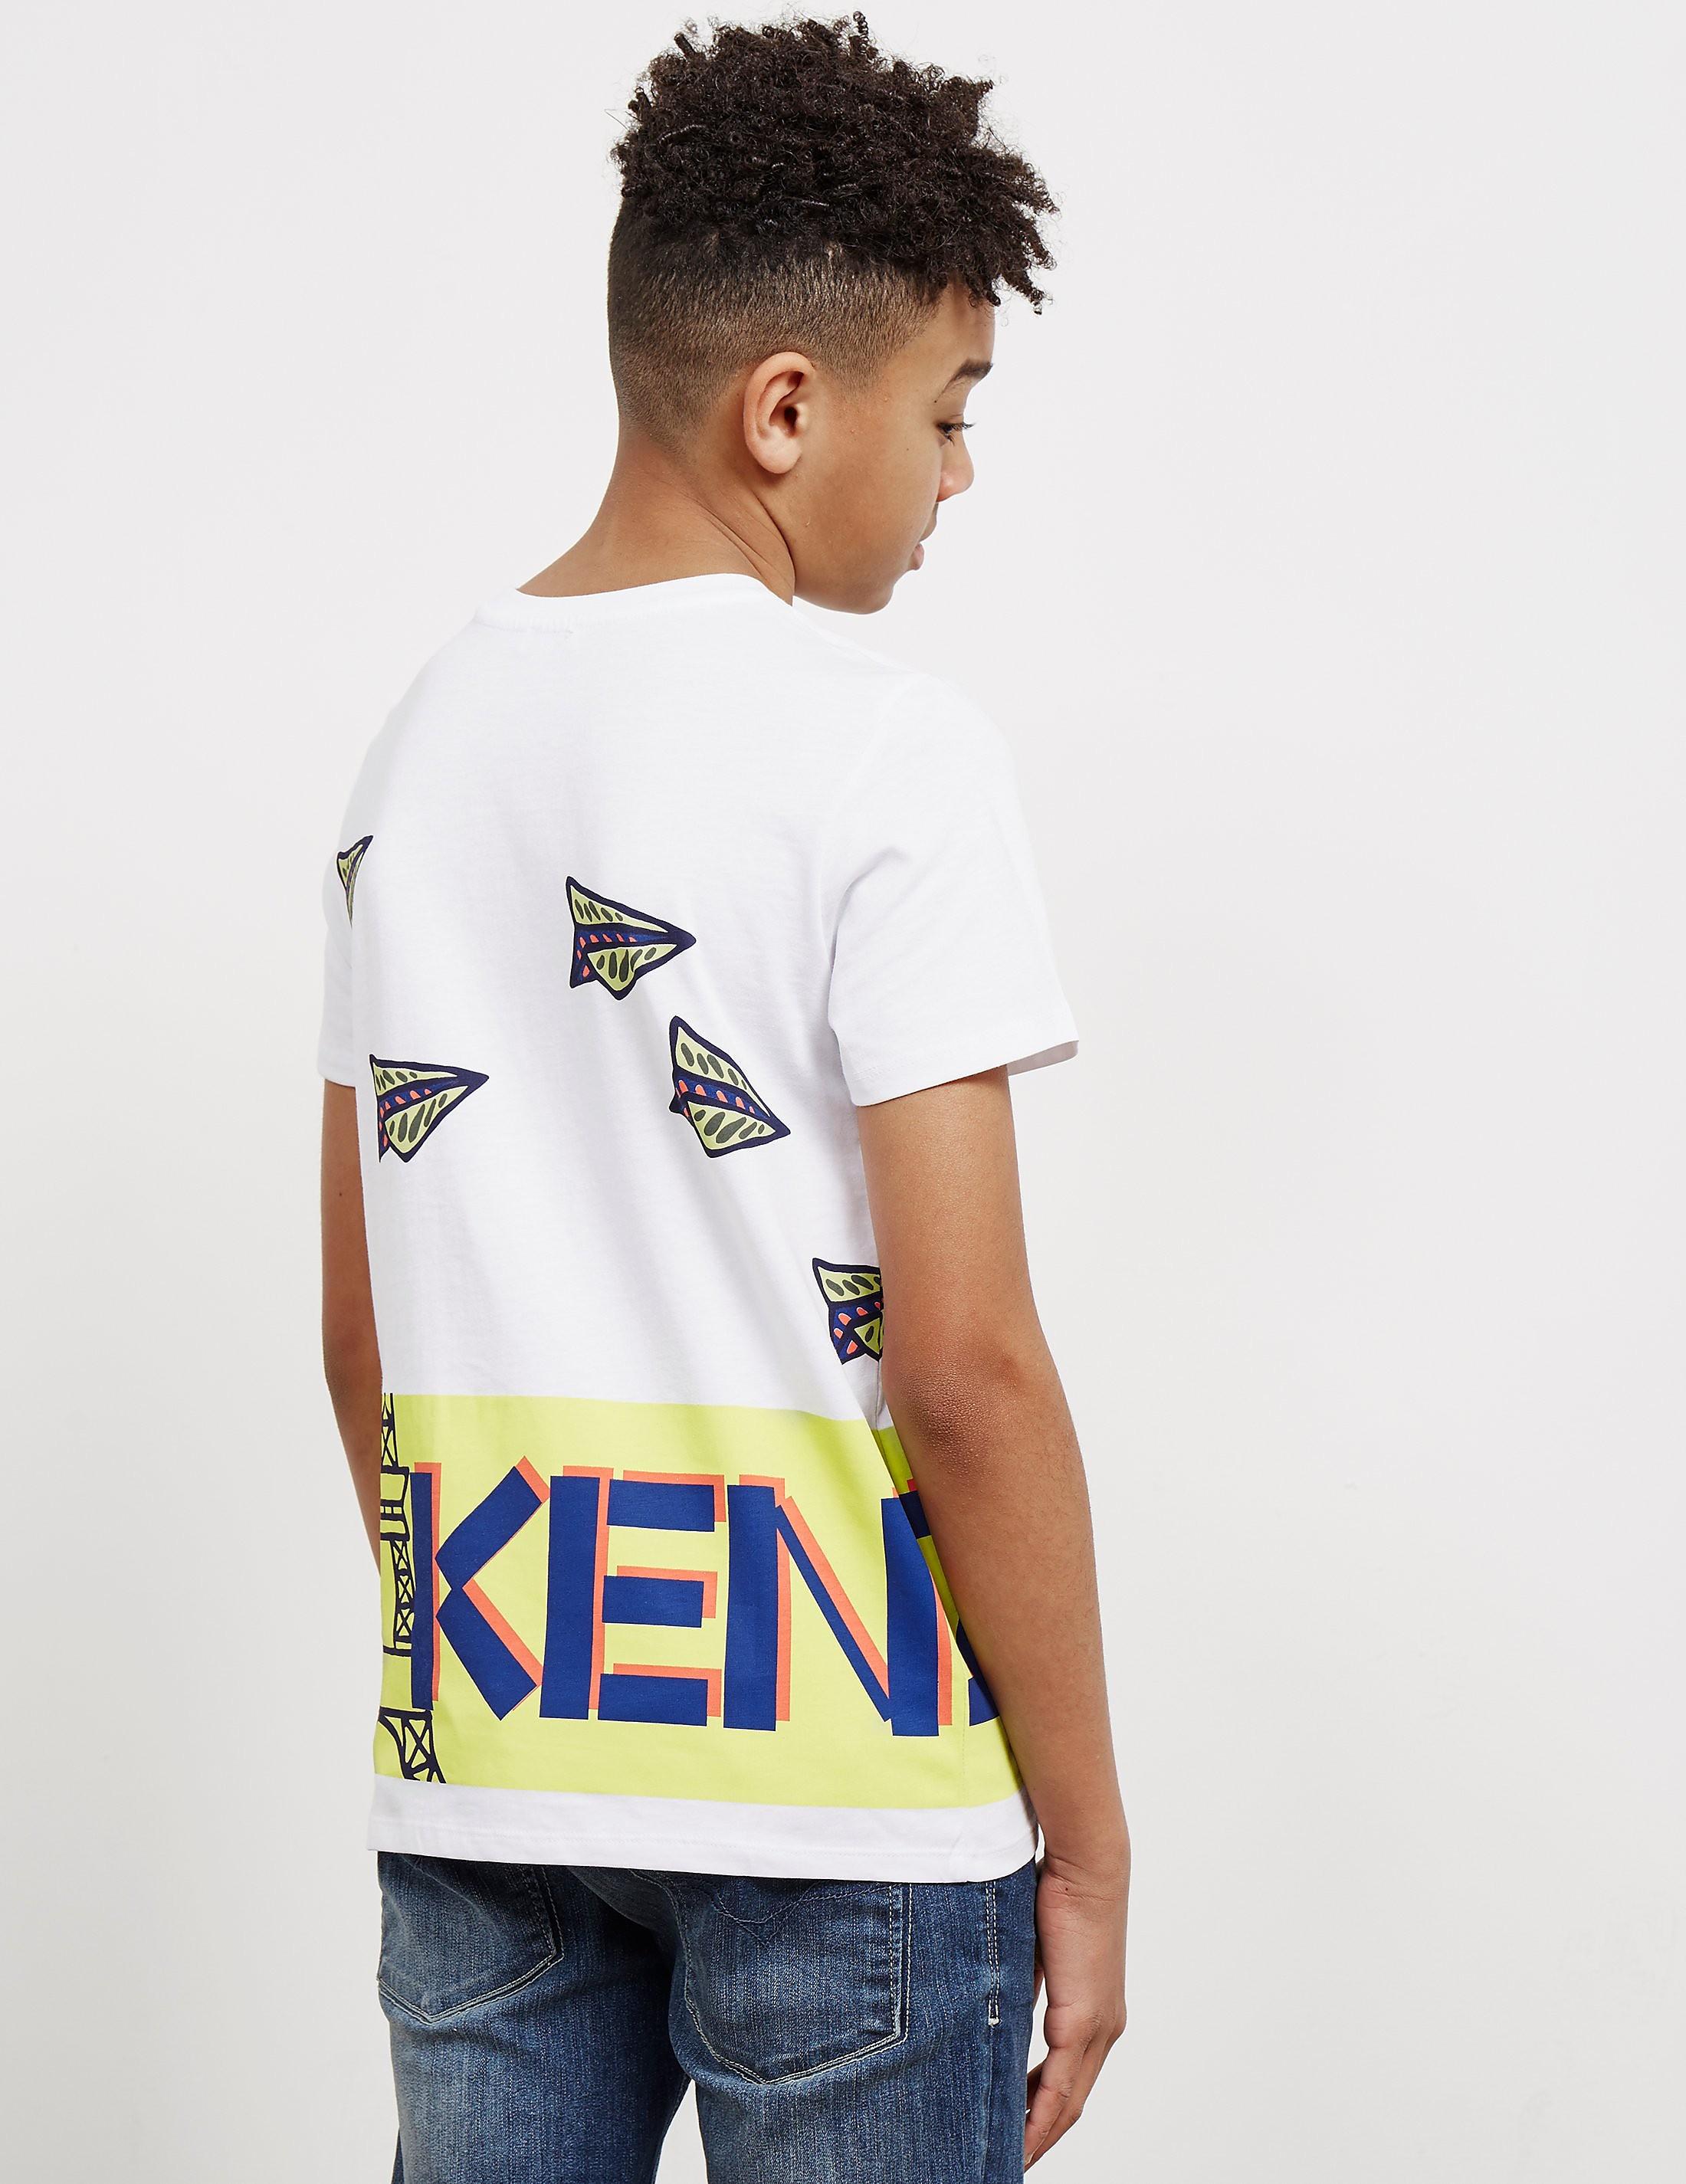 KENZO Plane Short Sleeve T-Shirt